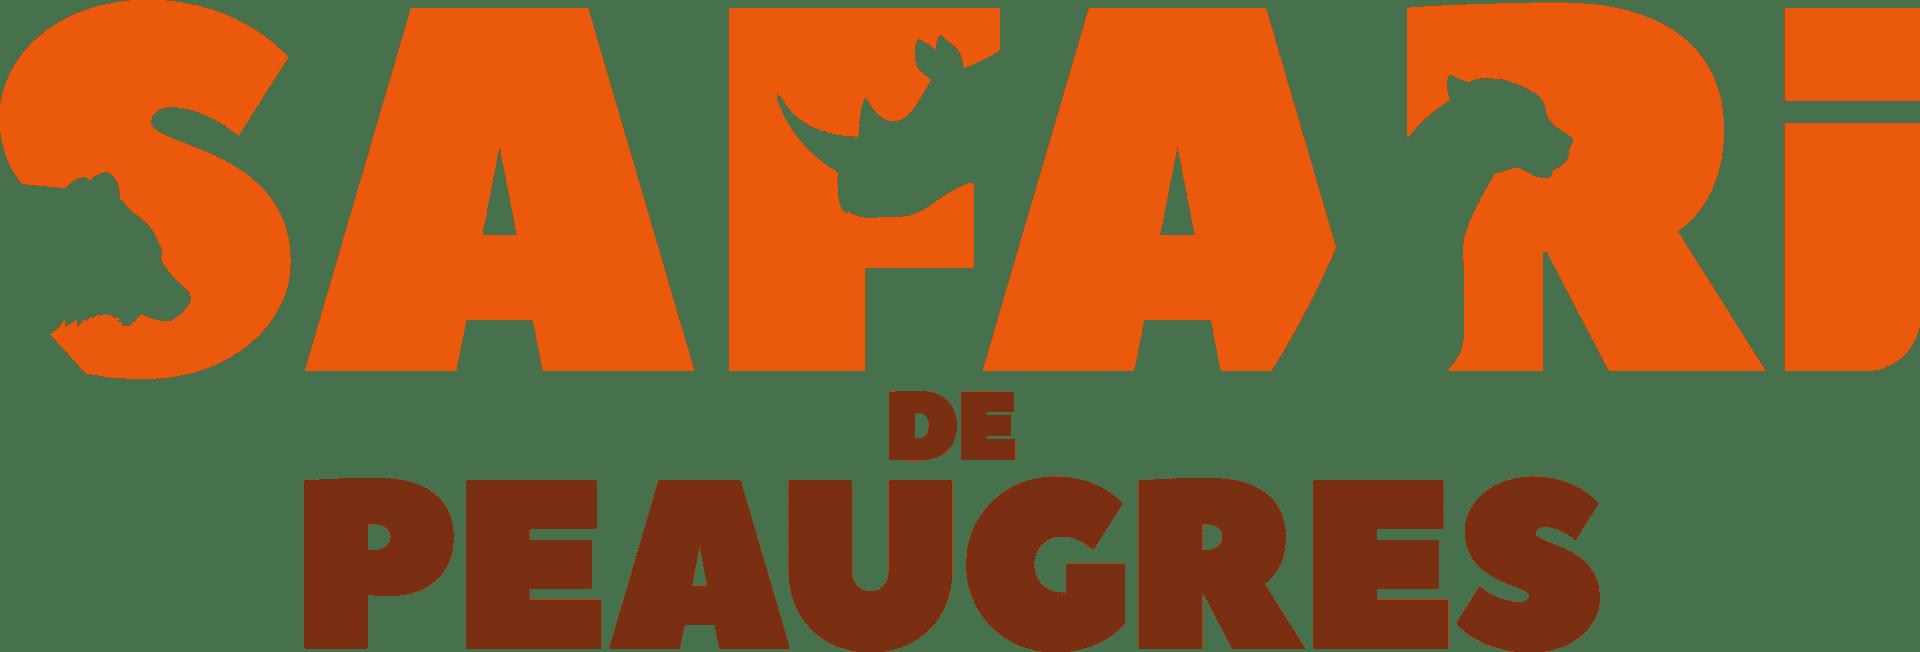 Les Zoos en France - Carte et infos saison 2020 94